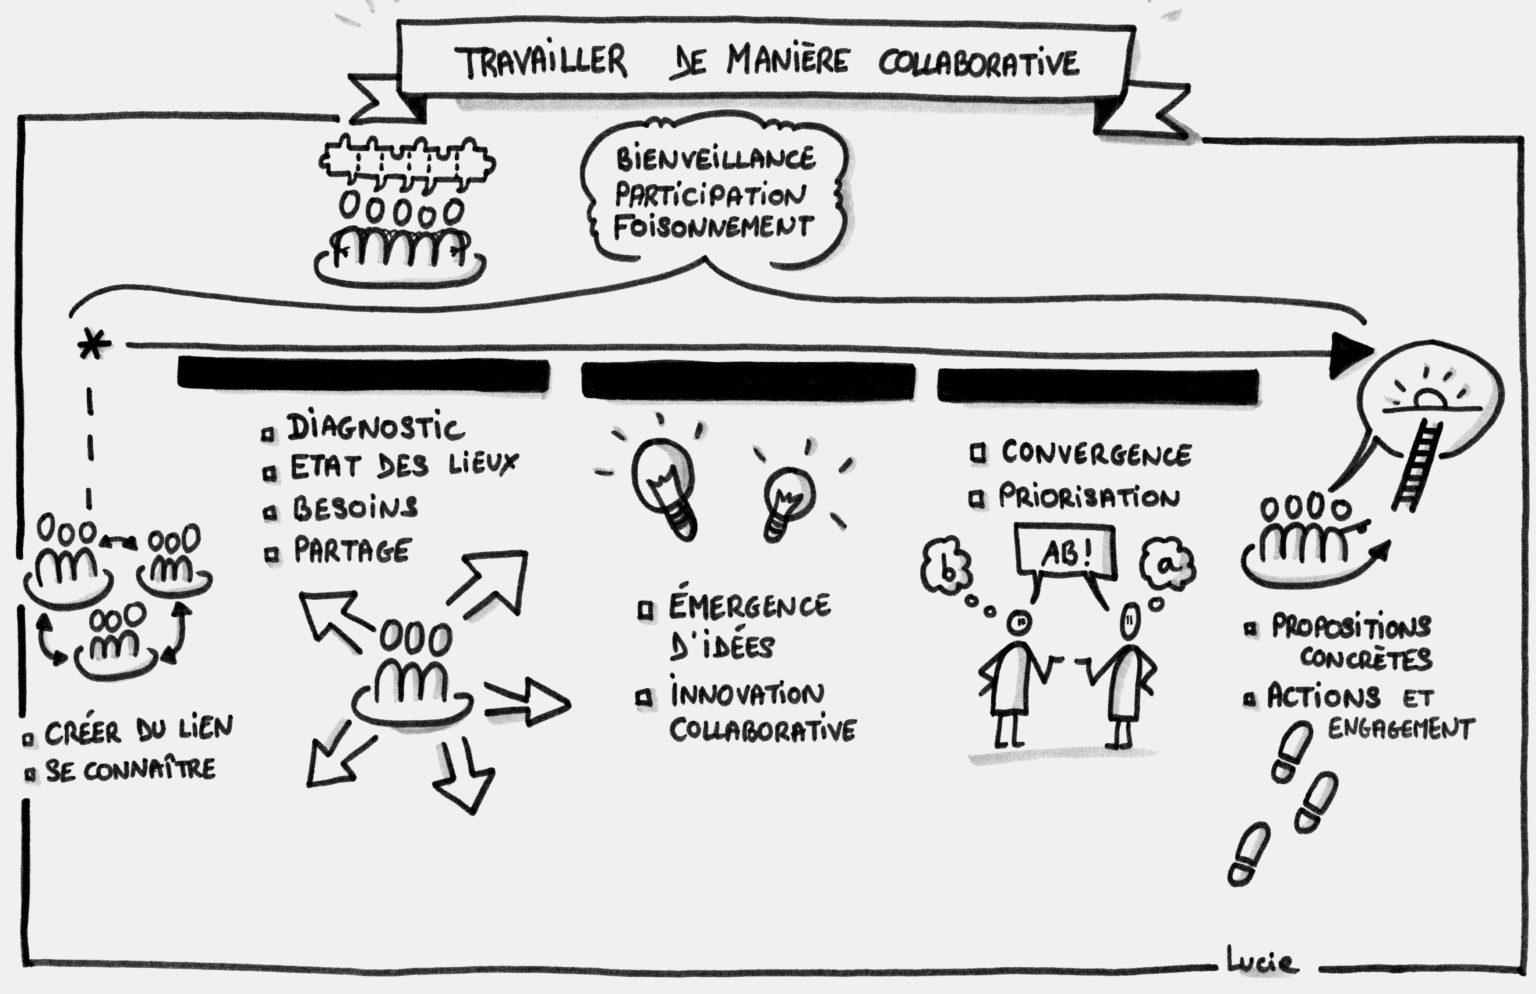 Process travail collaboratif